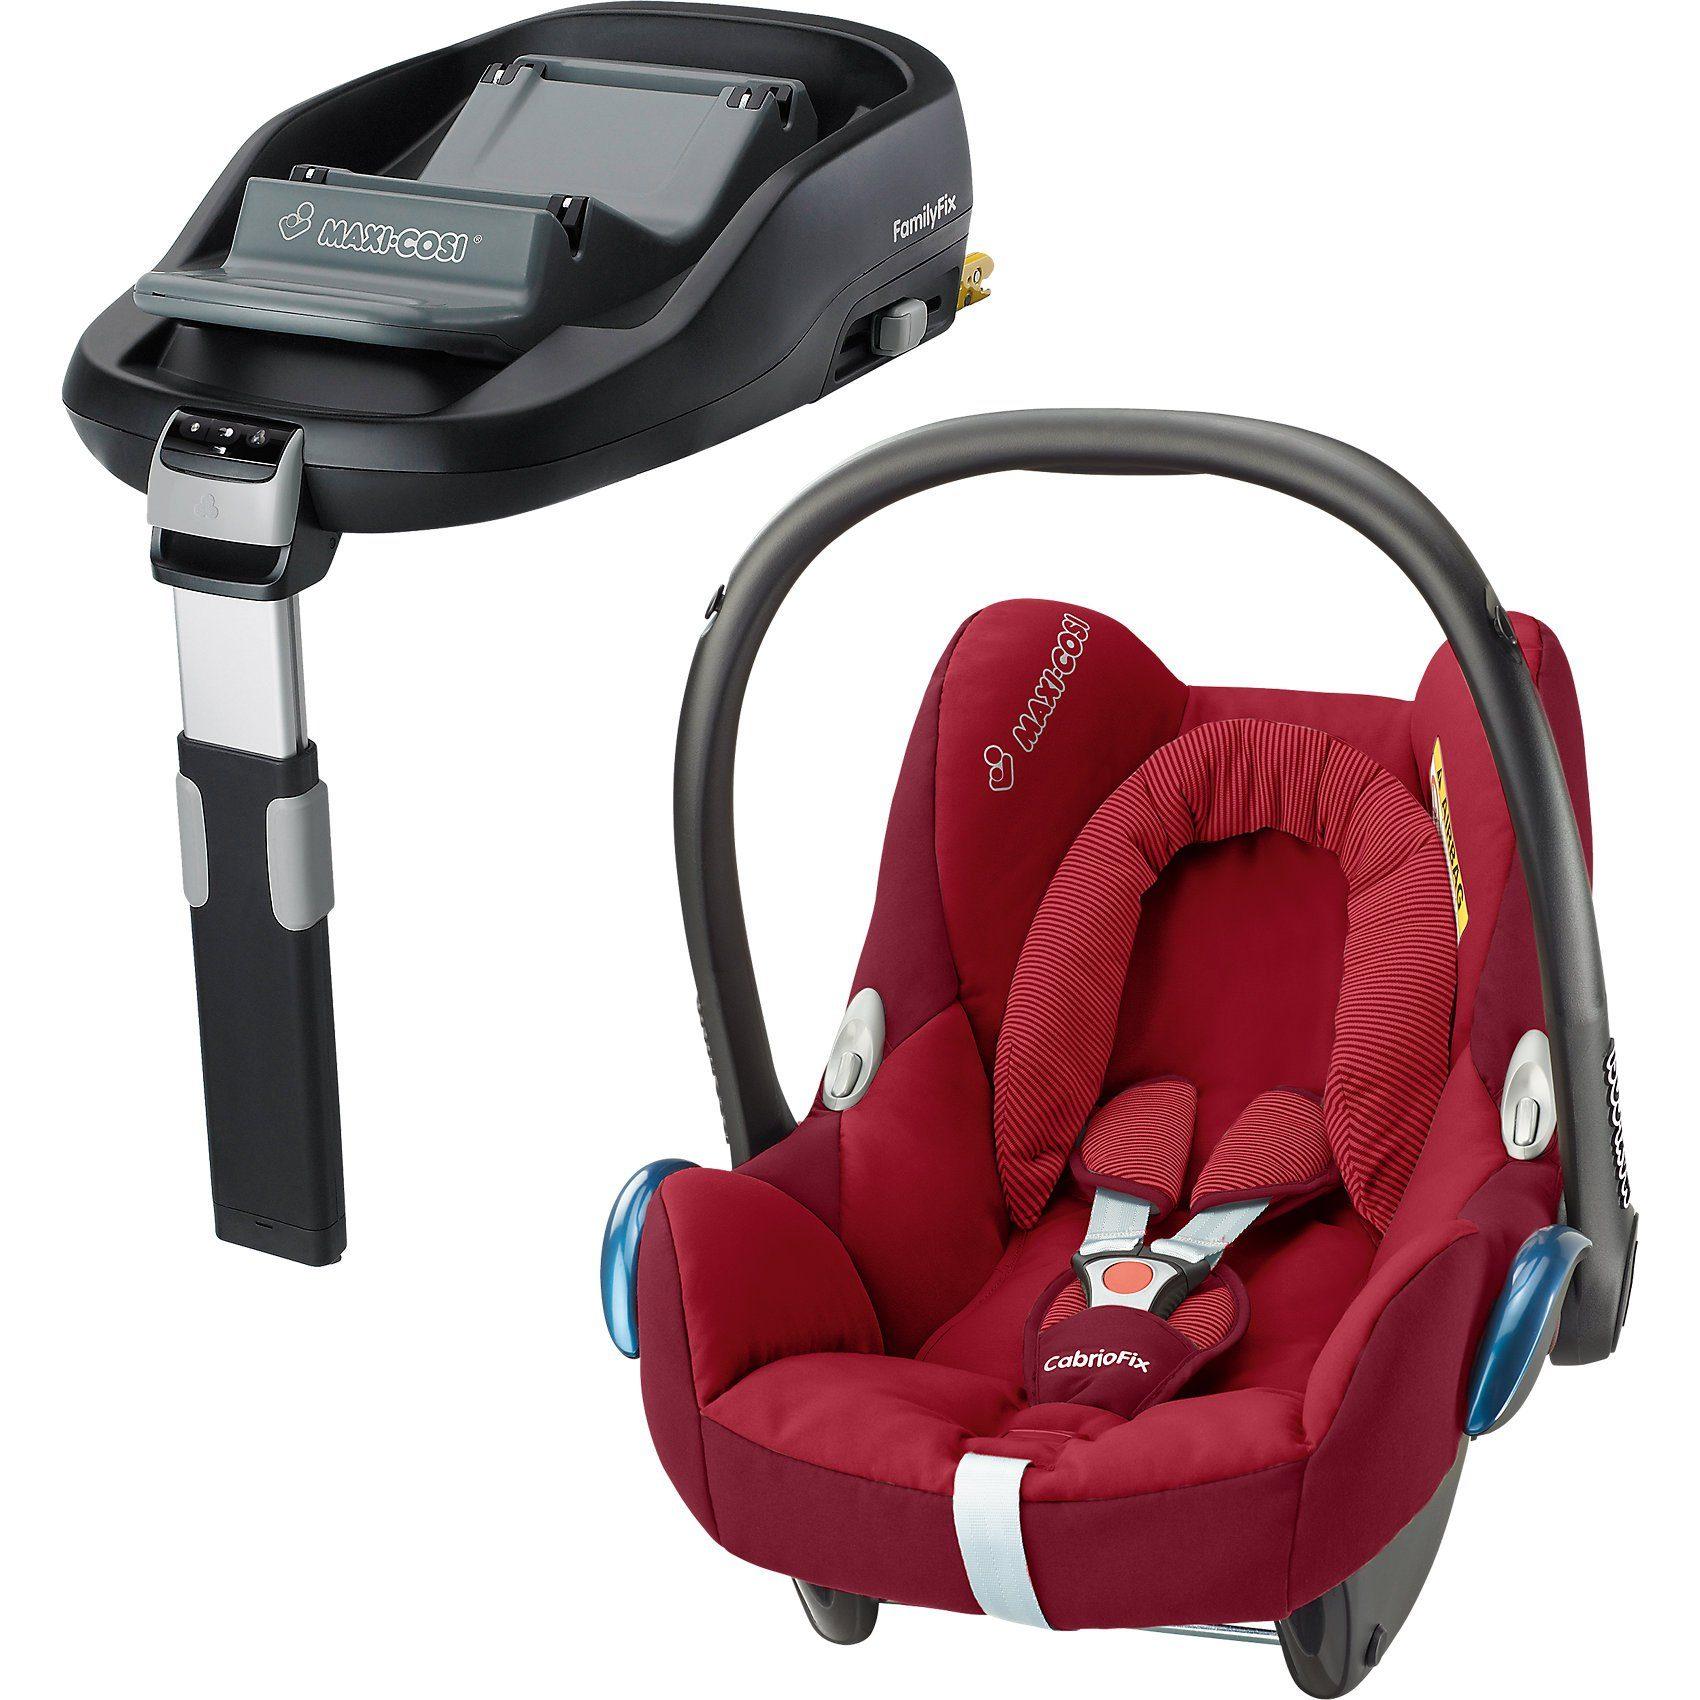 Maxi-Cosi Babyschale Cabriofix, robin red, inkl. FamilyFix